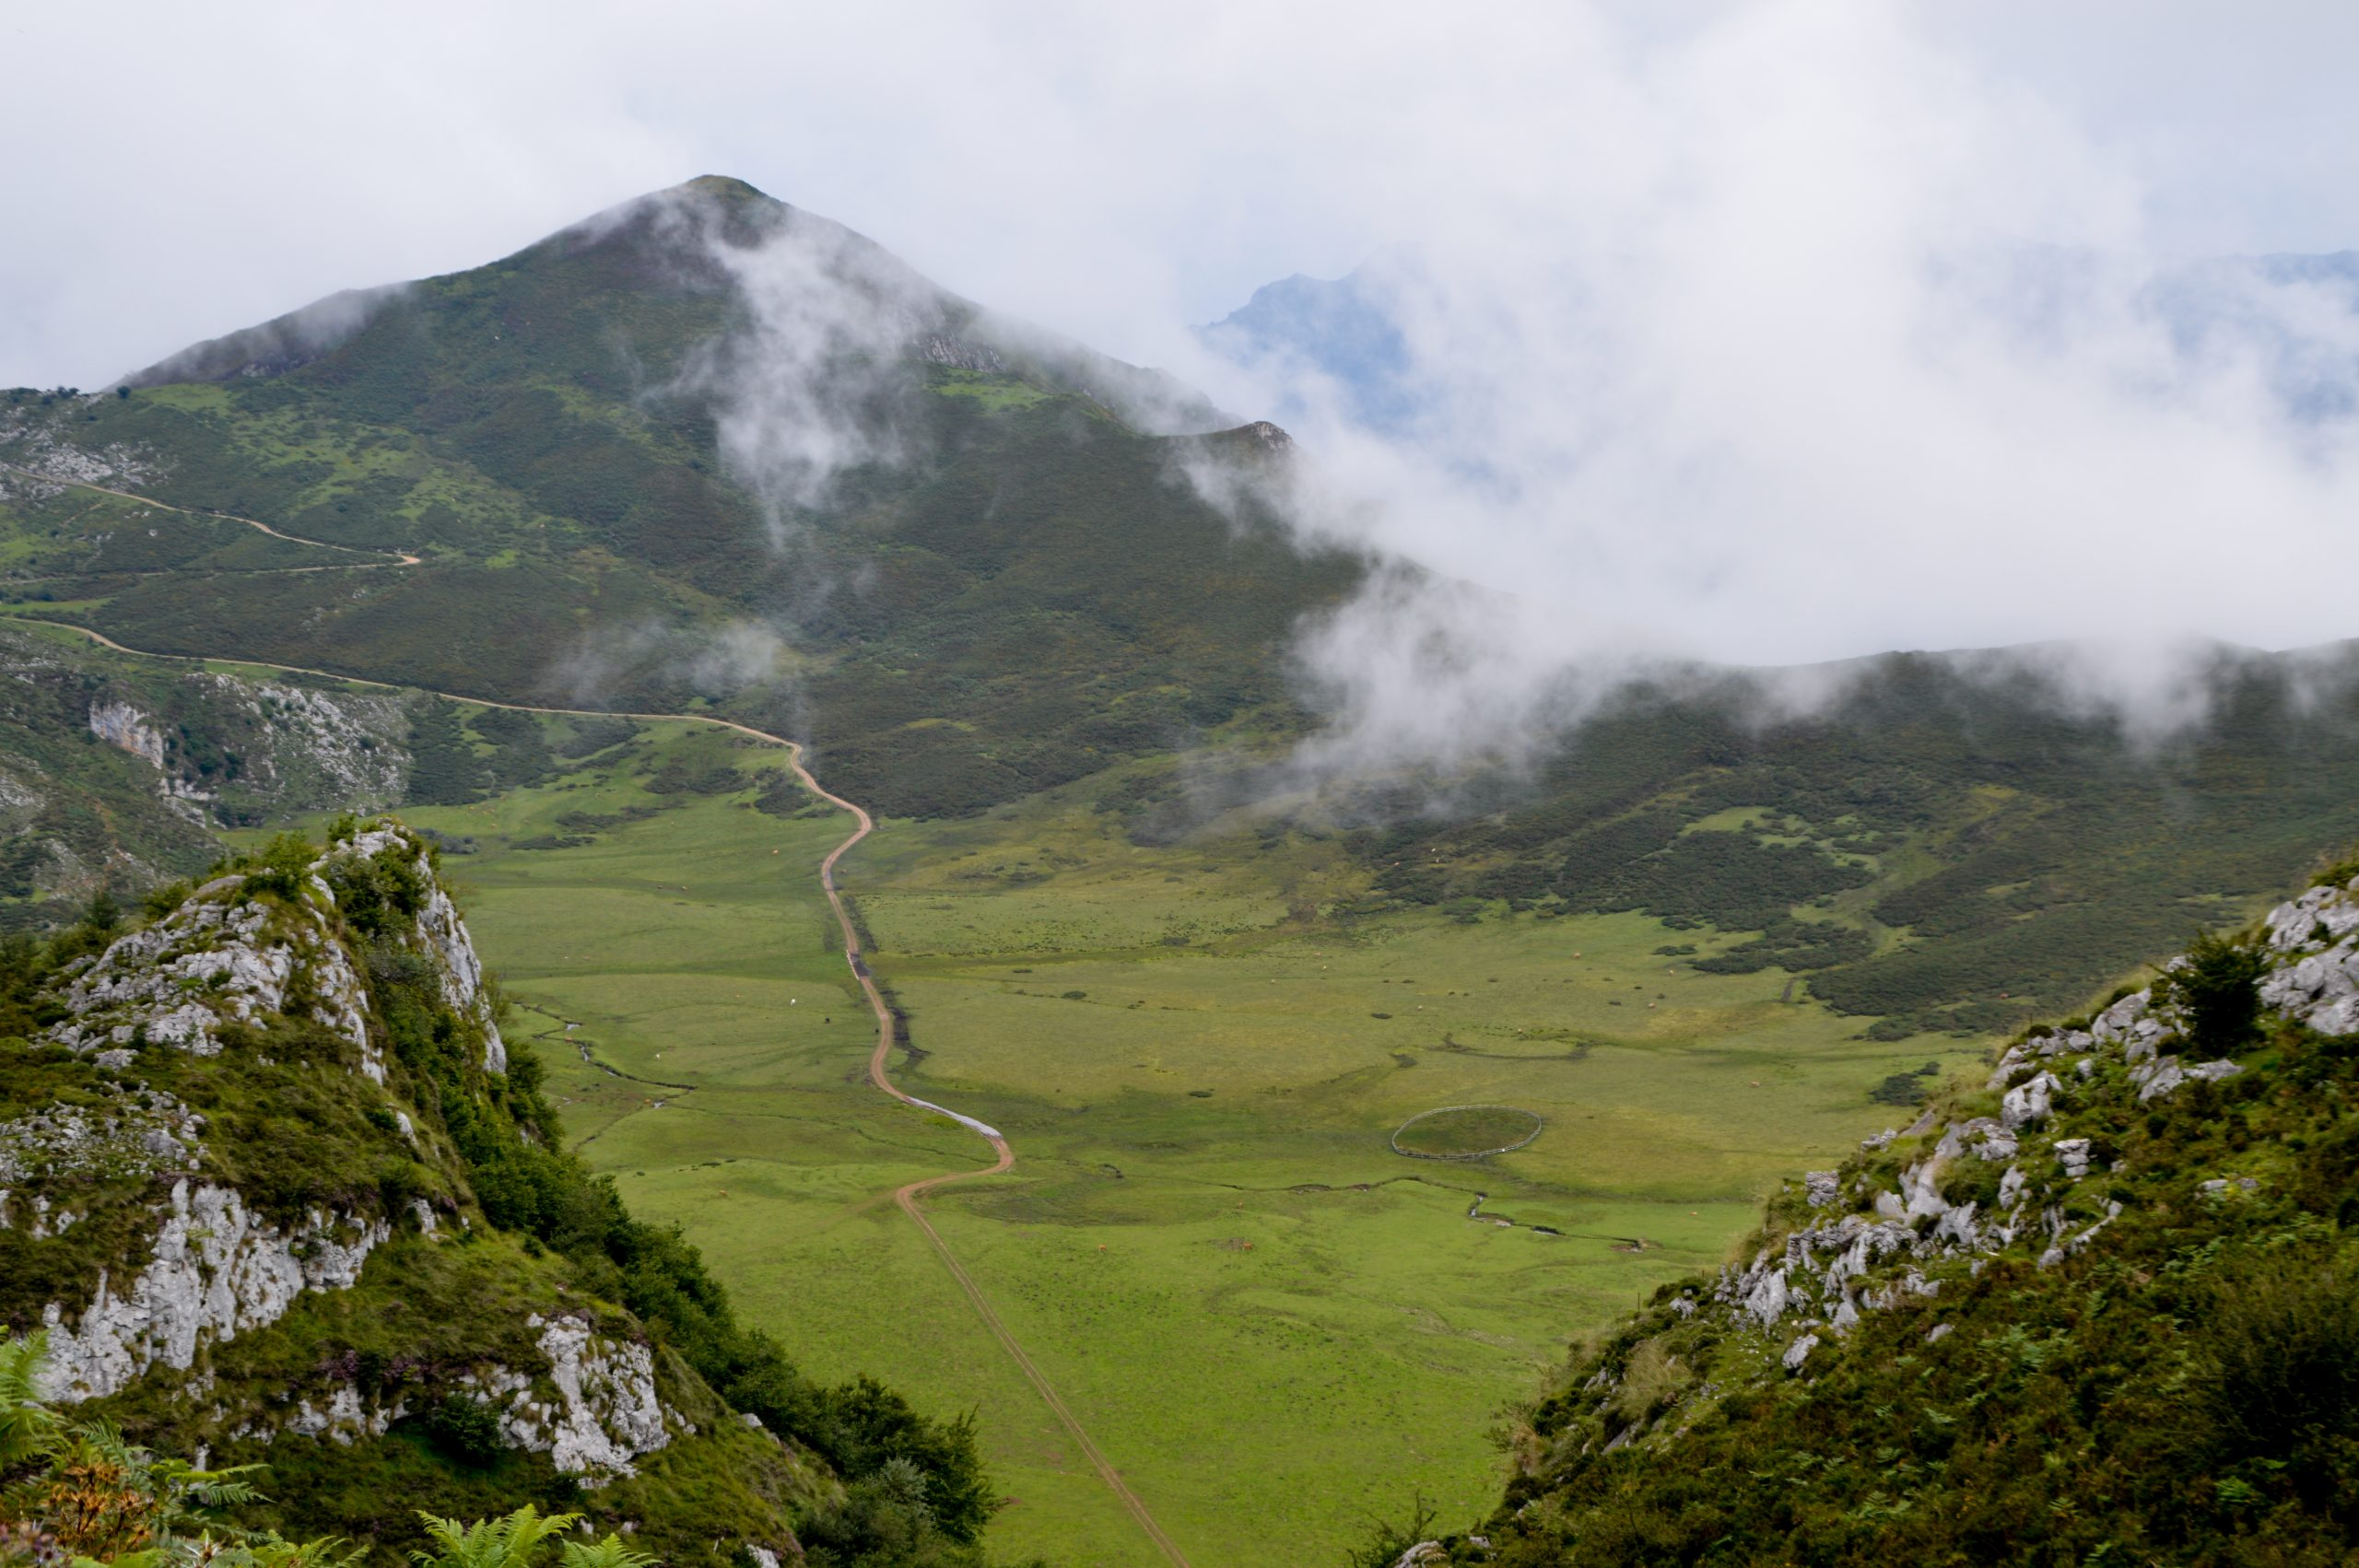 Mirador de la Reina Lagos de Covadonga